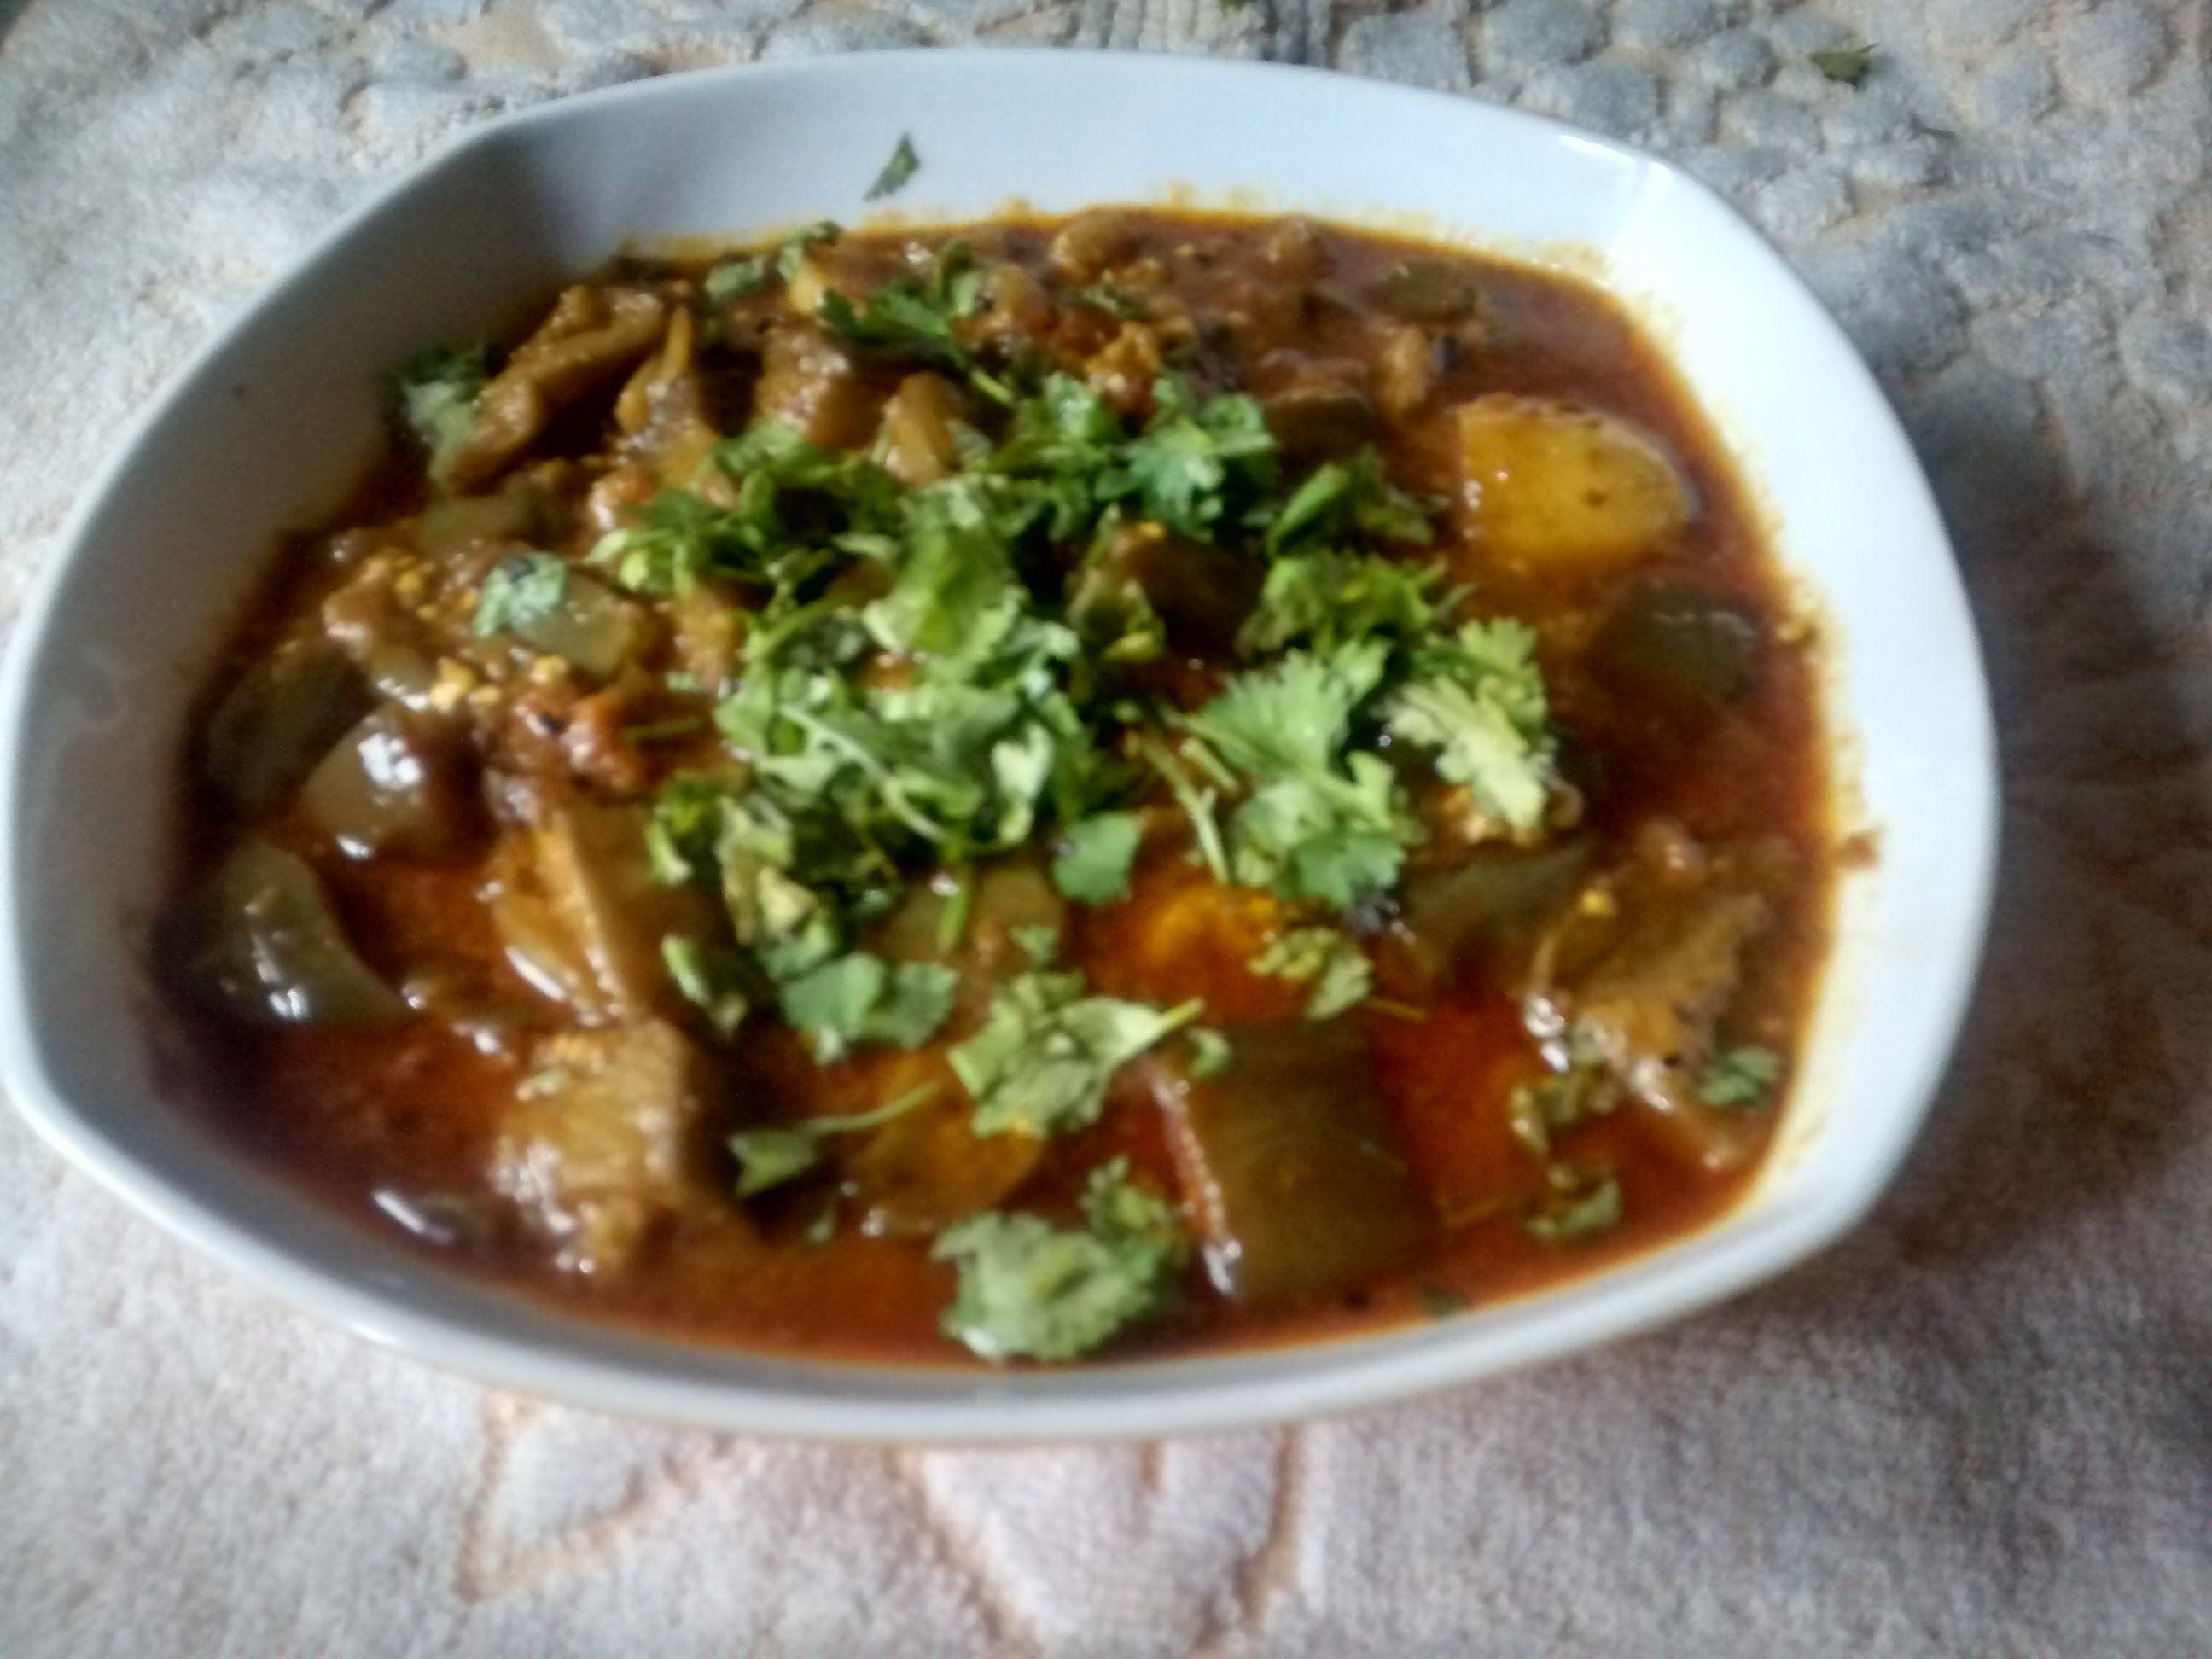 Aloo baigan ki subzi potato eggplant vegetable in hindi urdu this aloo baingan ki sabzi potatoes and eggplant vegetable is a simple easy tasty indian dish to prepare forumfinder Images